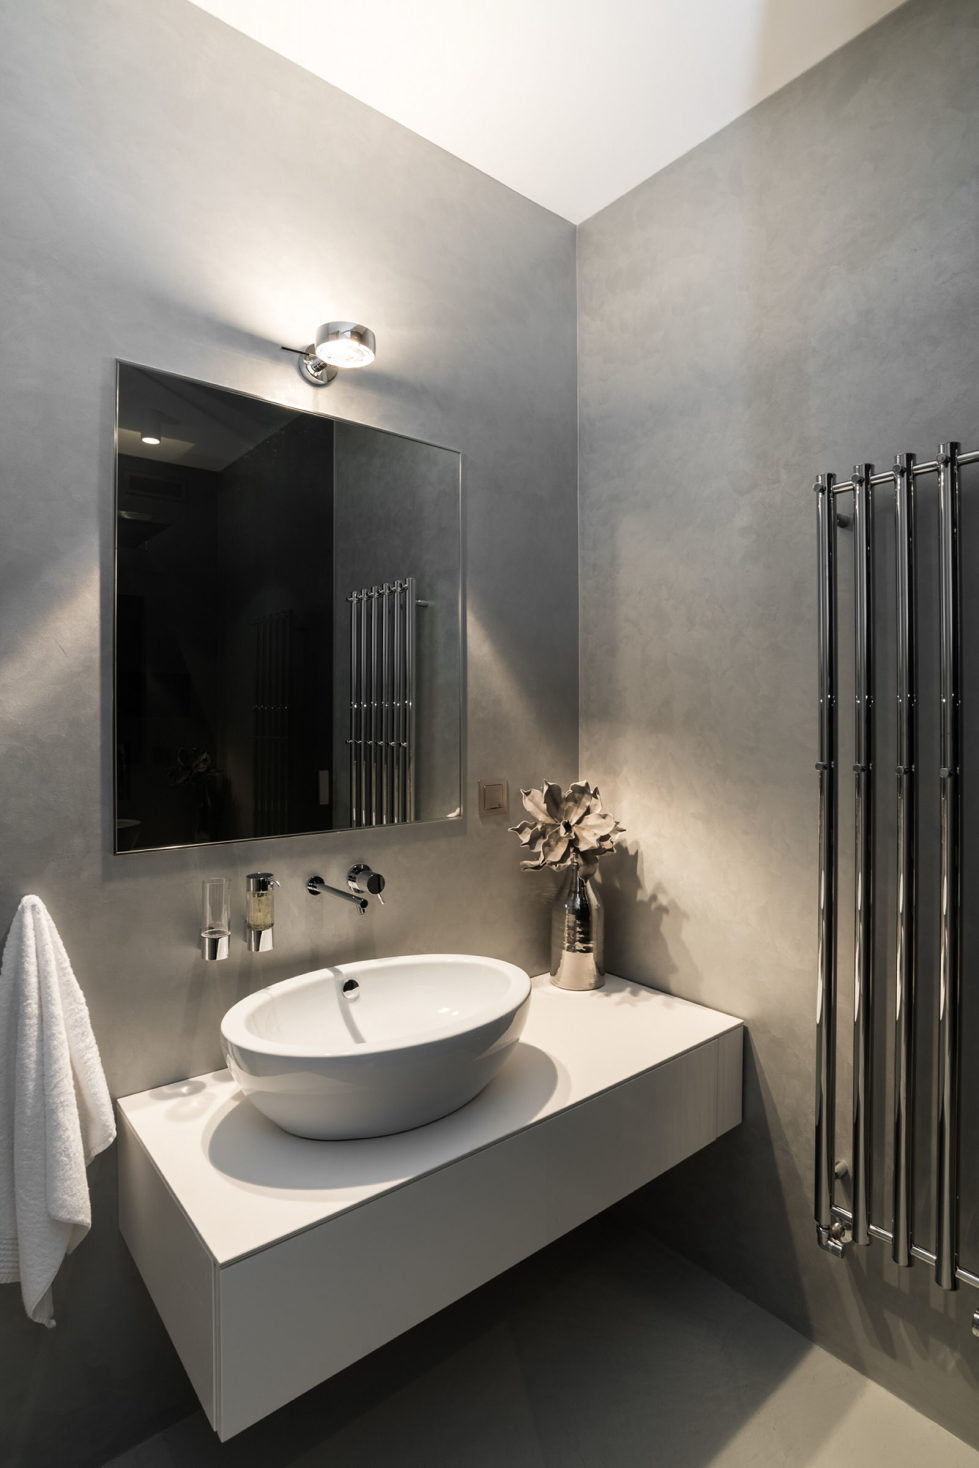 12 Lofts In Prague From OOOOX Studio 22